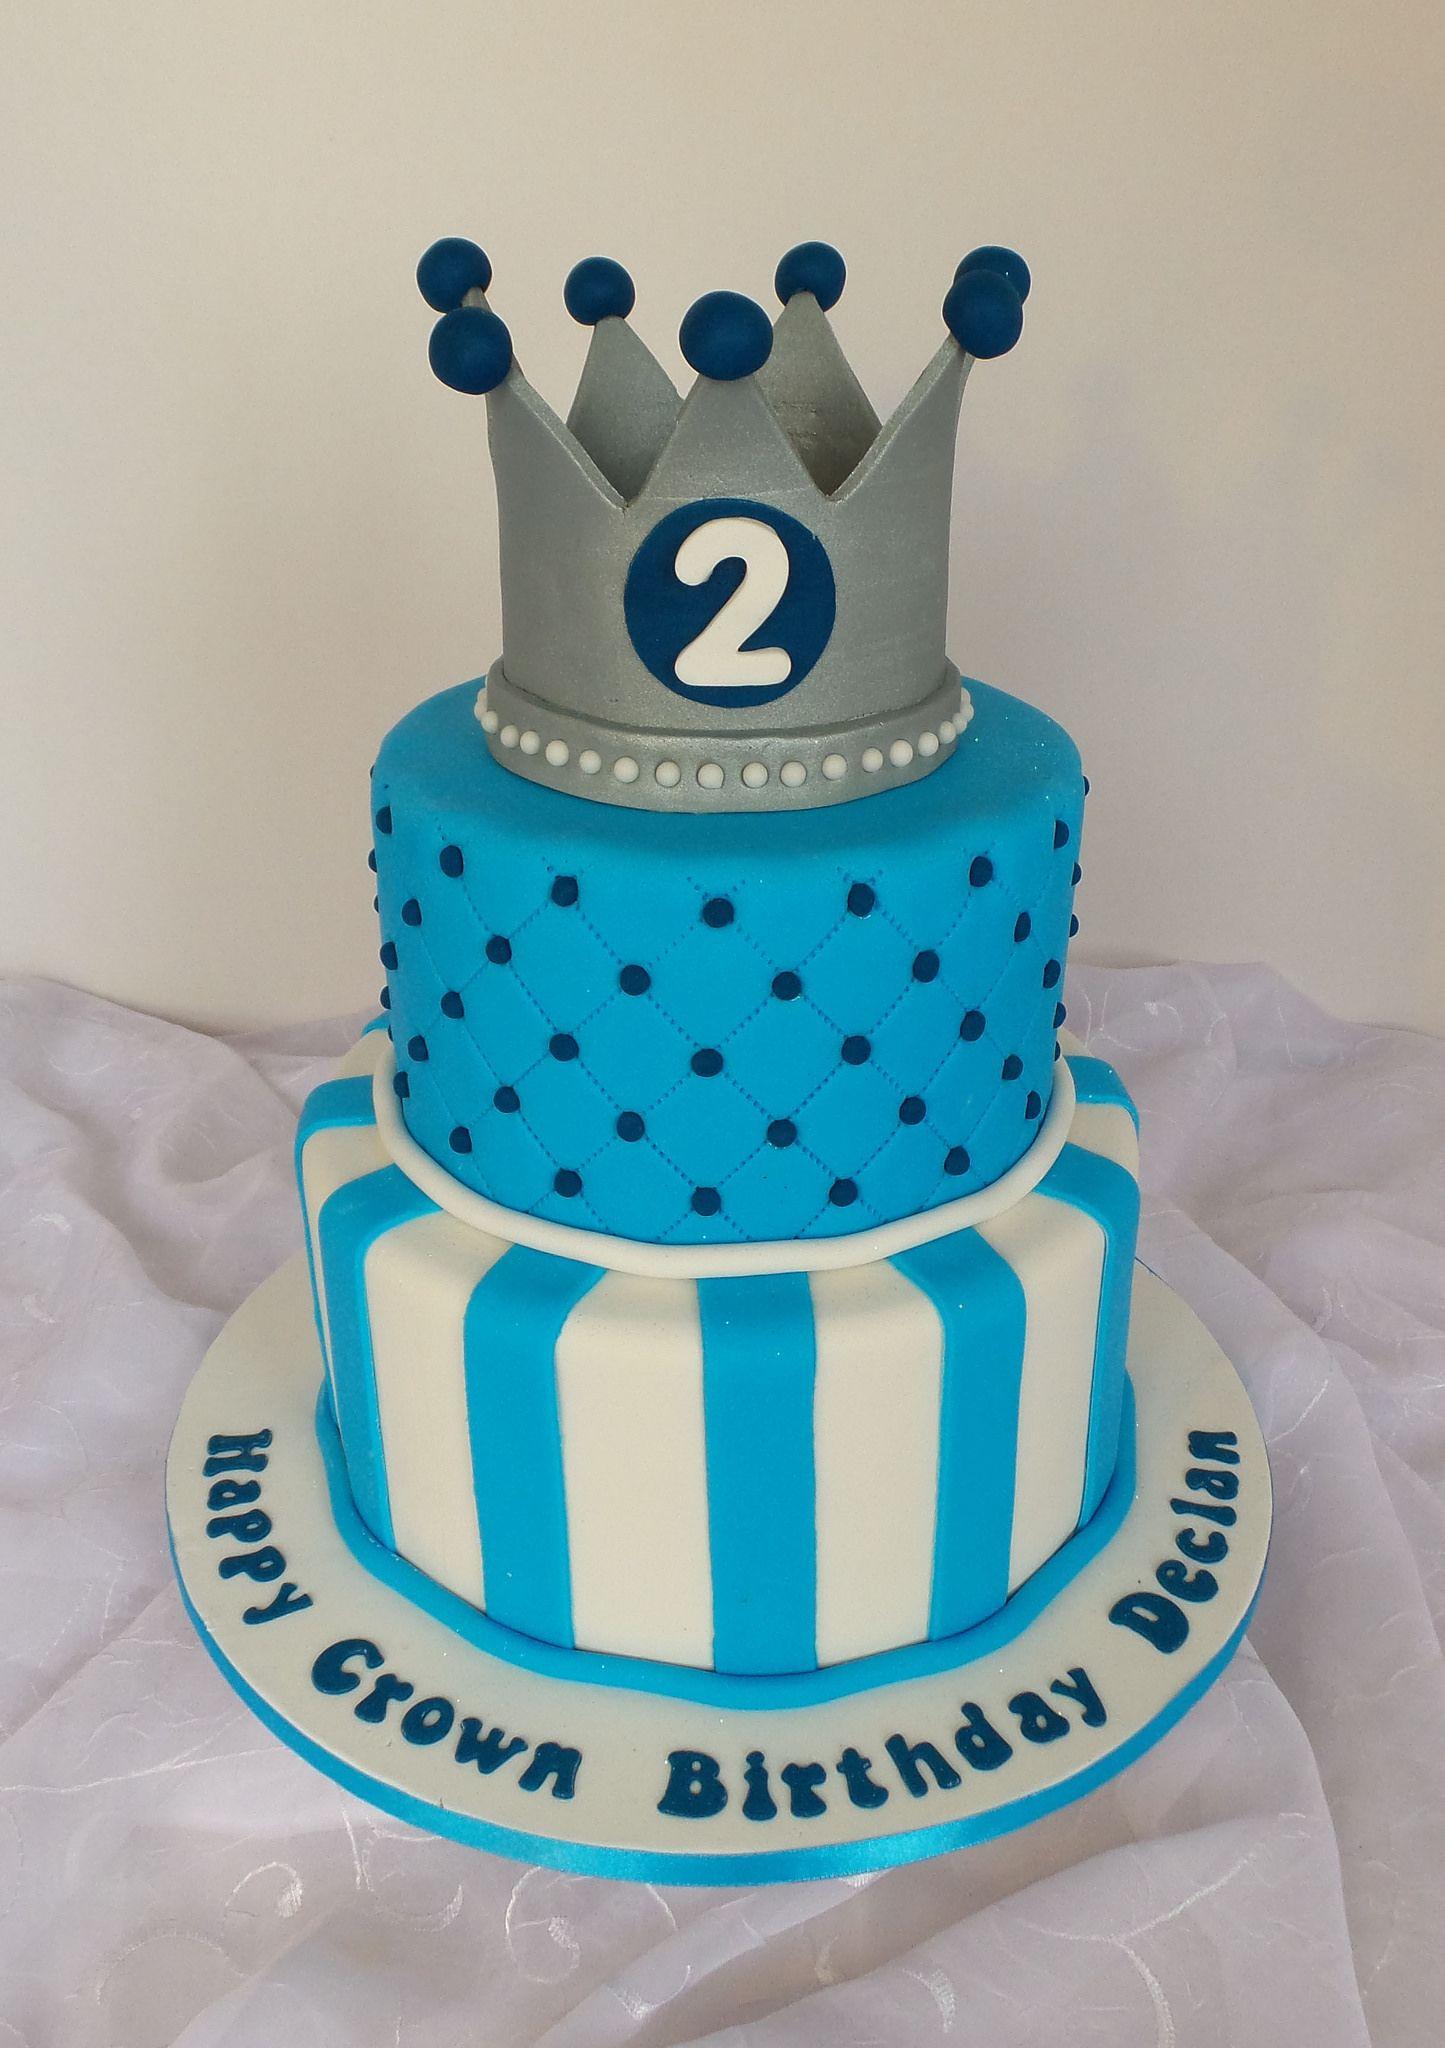 Boys Crown Birthday Cake Birthday cake design, Cake